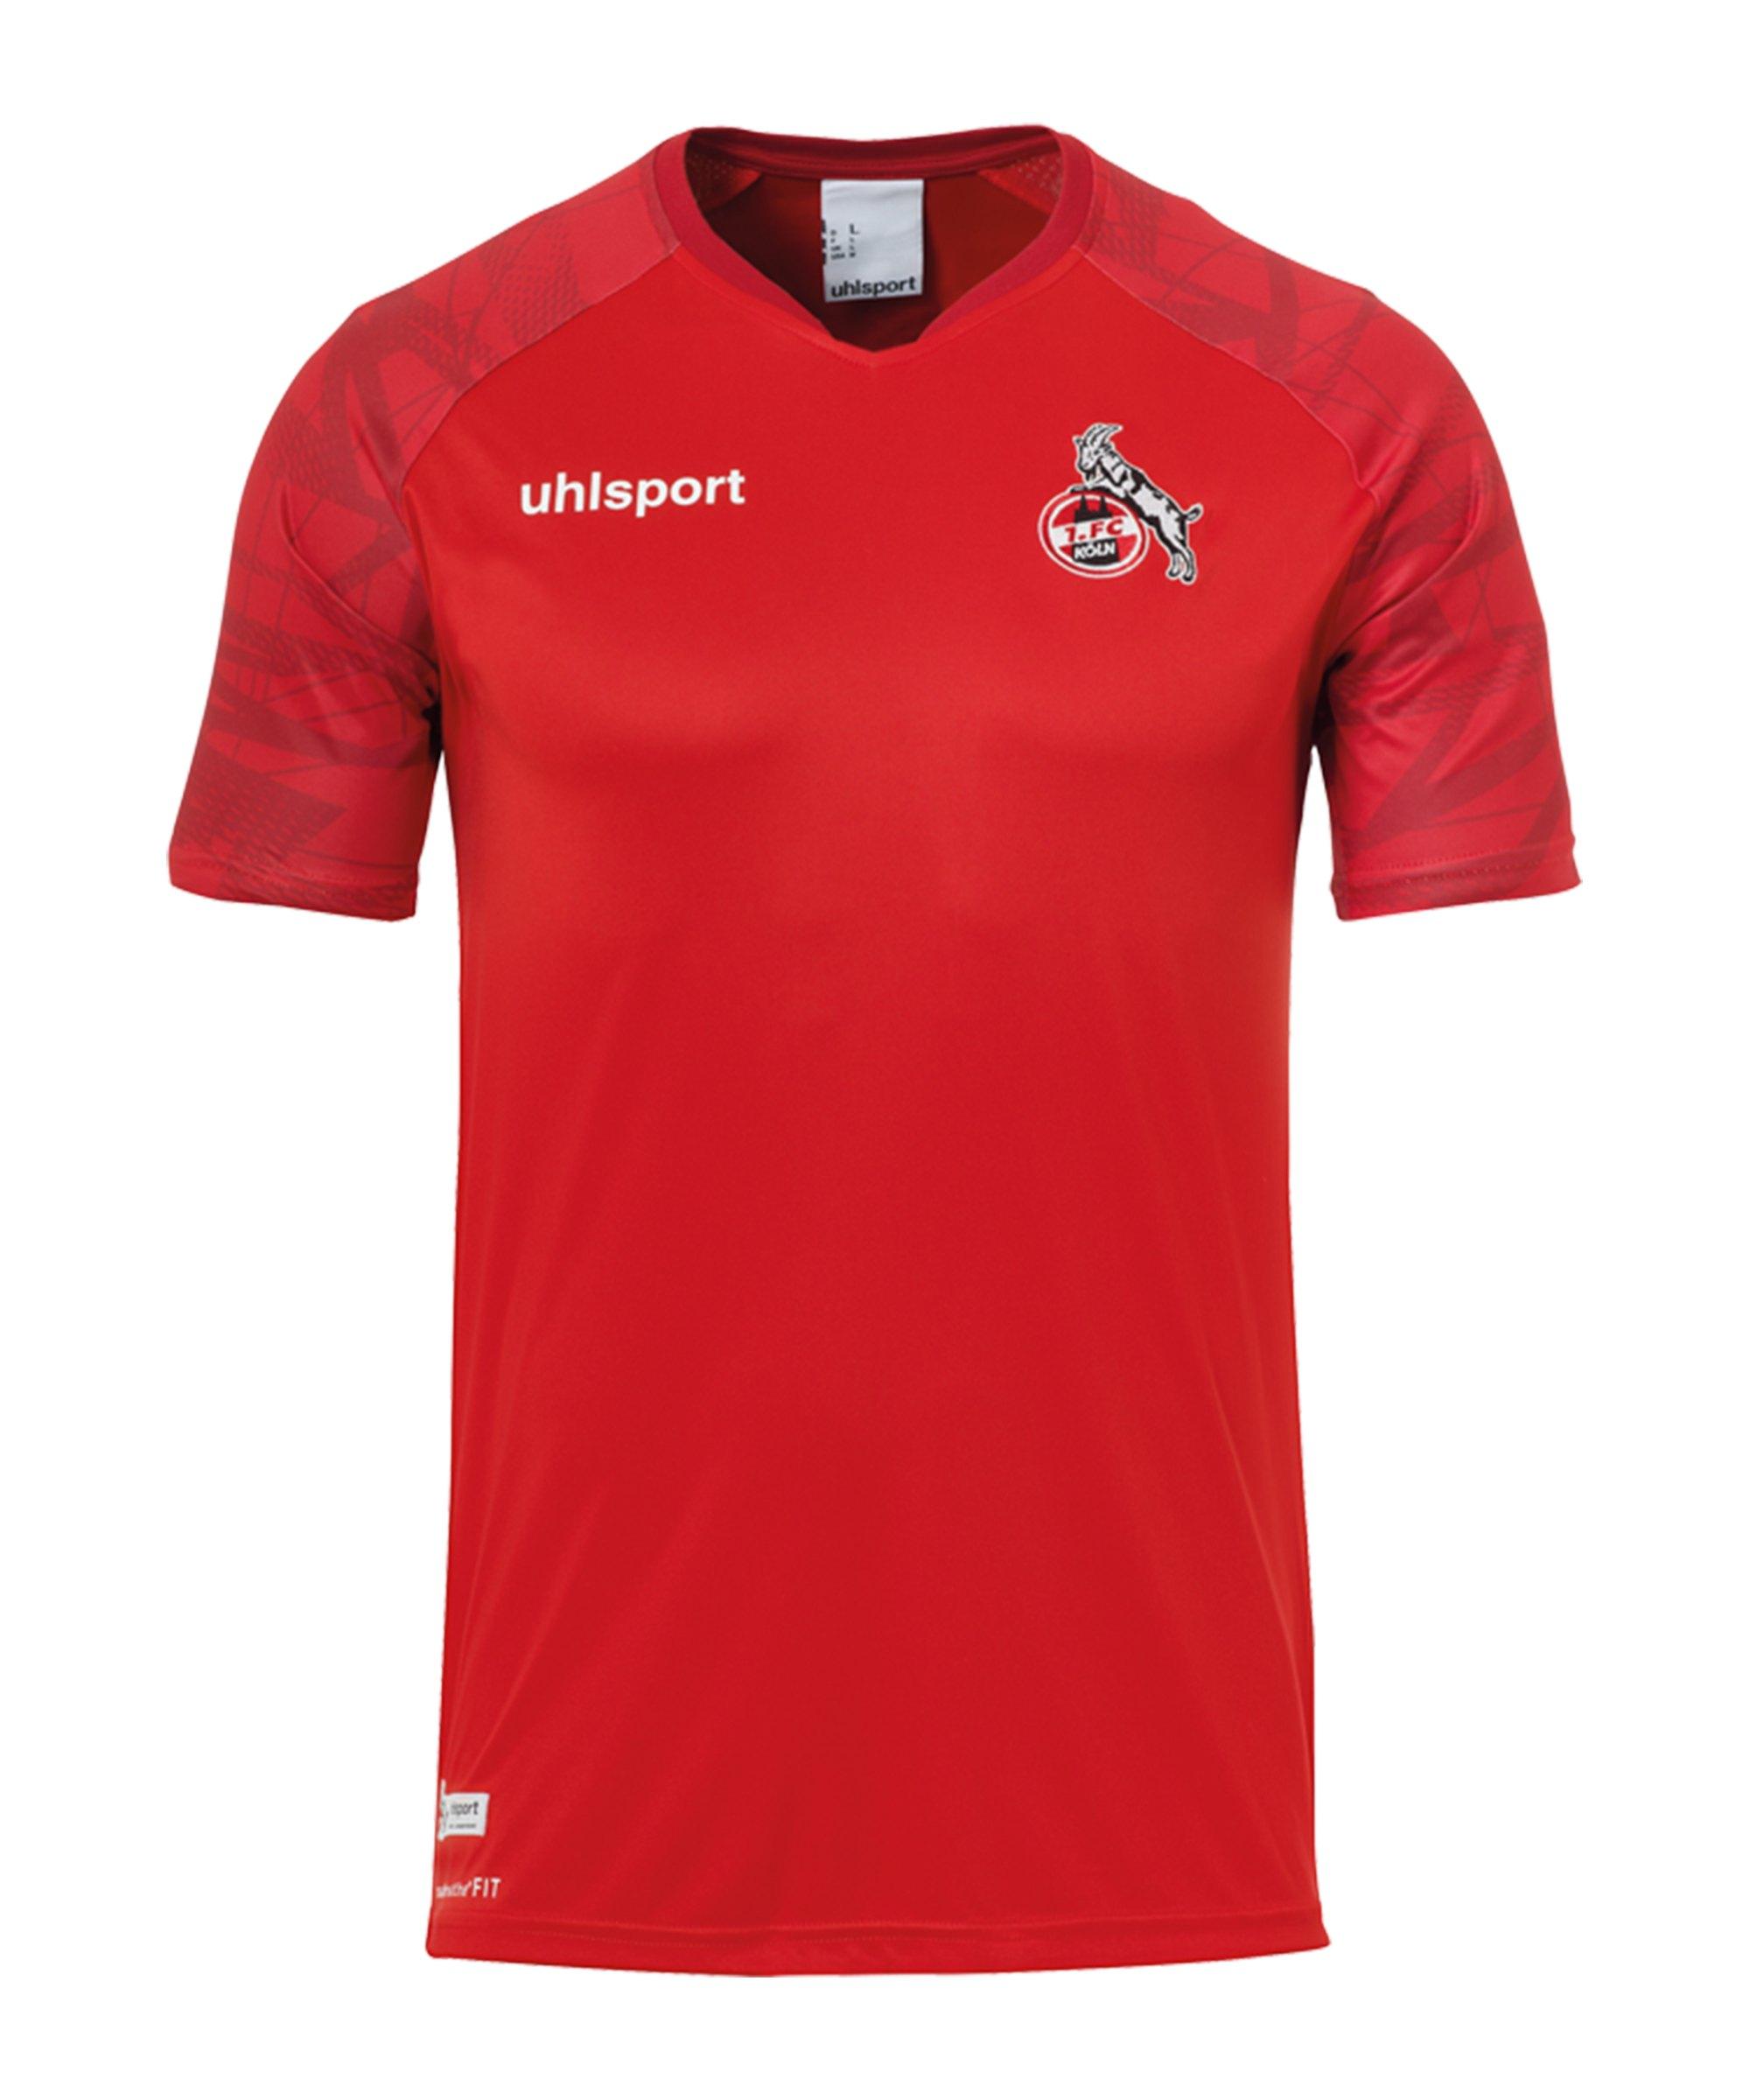 Uhlsport 1. FC Köln Goal24 Trainingsshirt Rot - rot